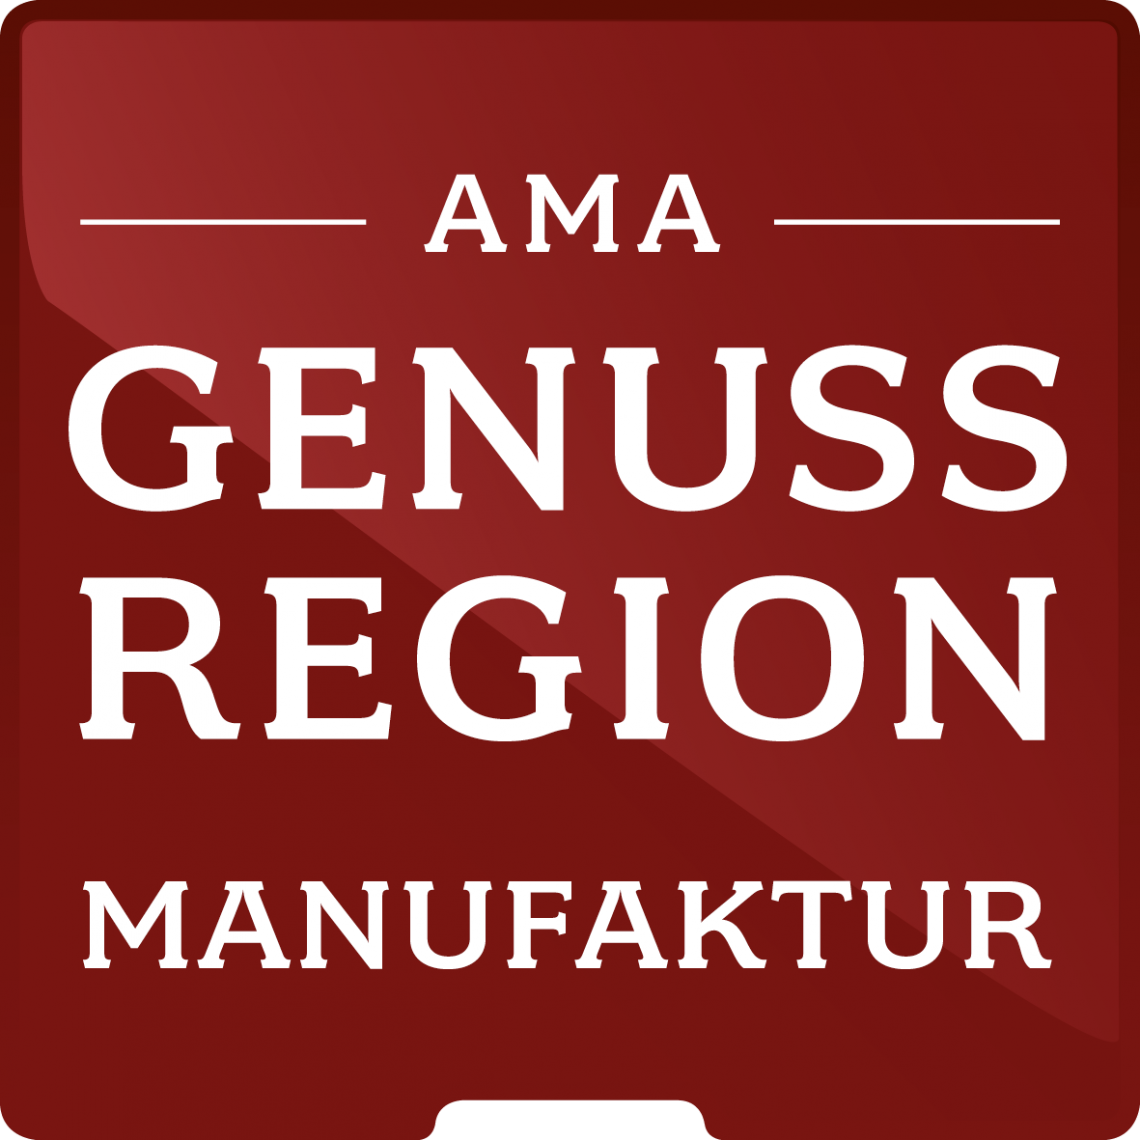 Genuss Region